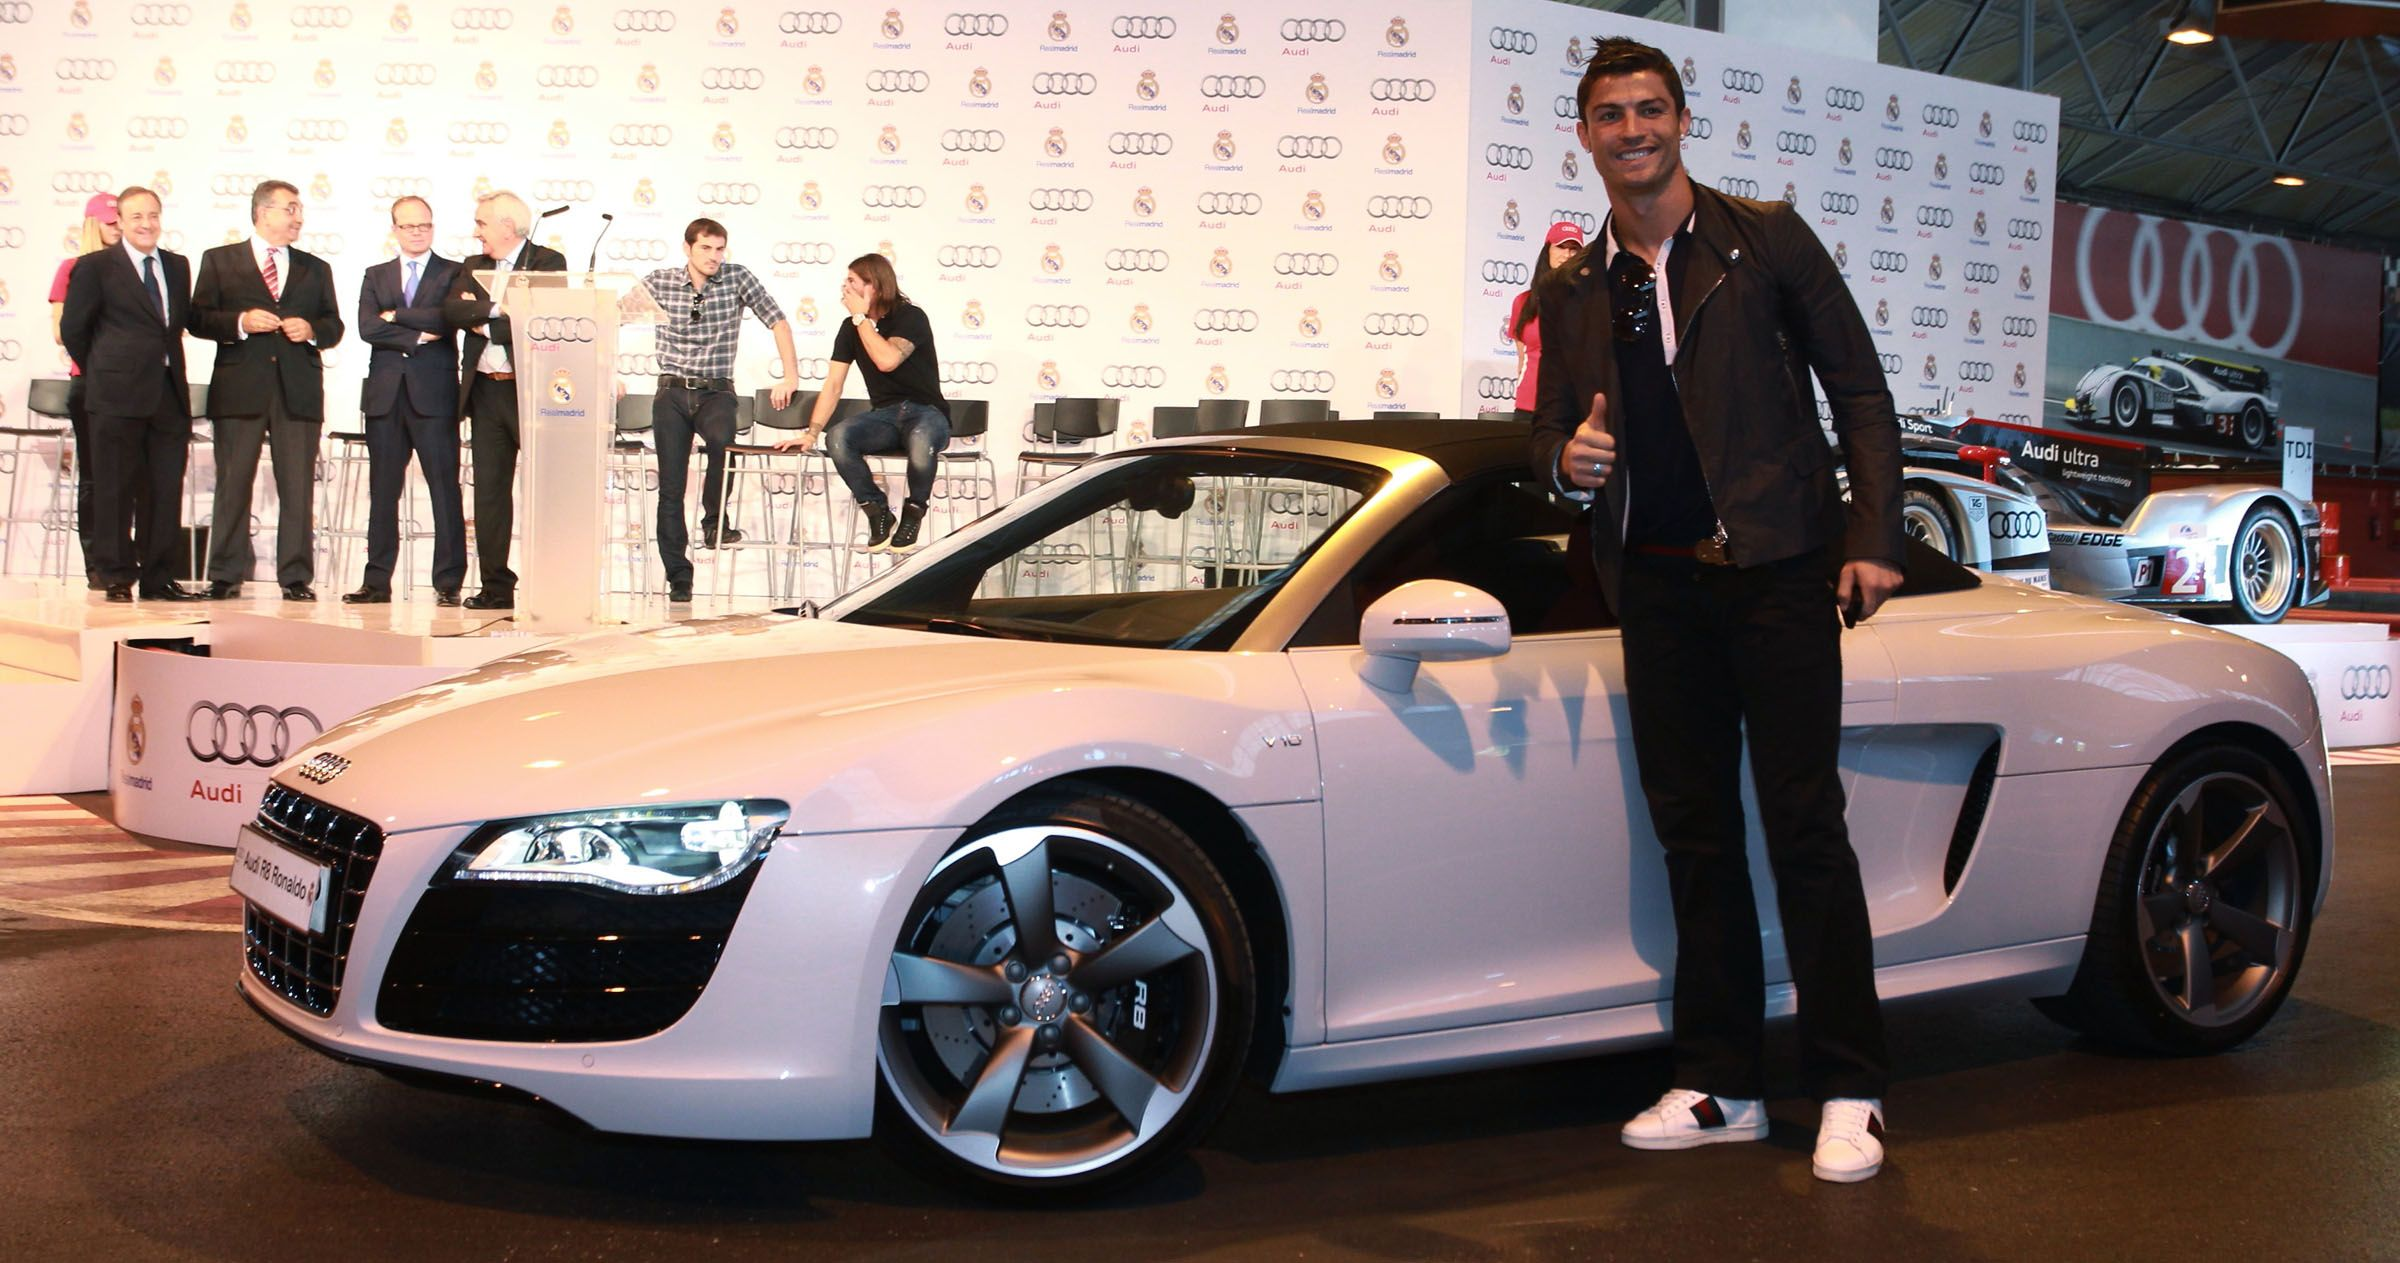 10 Amazing Supercars of Cristiano Ronaldo